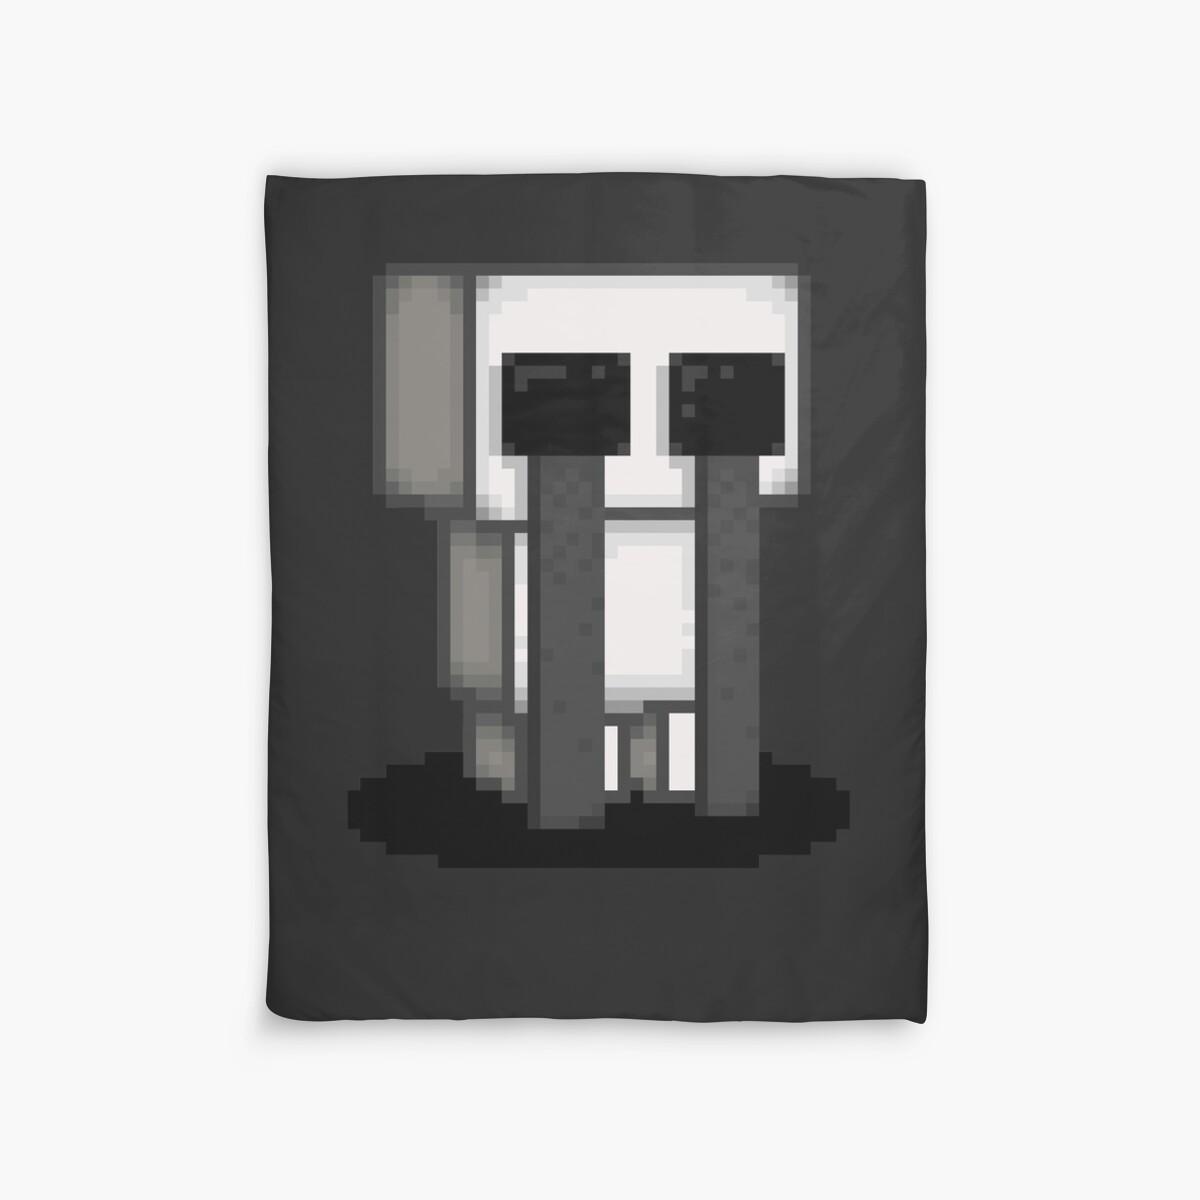 Quot Adventure Crying Child Fnaf World Pixel Art Quot Duvet